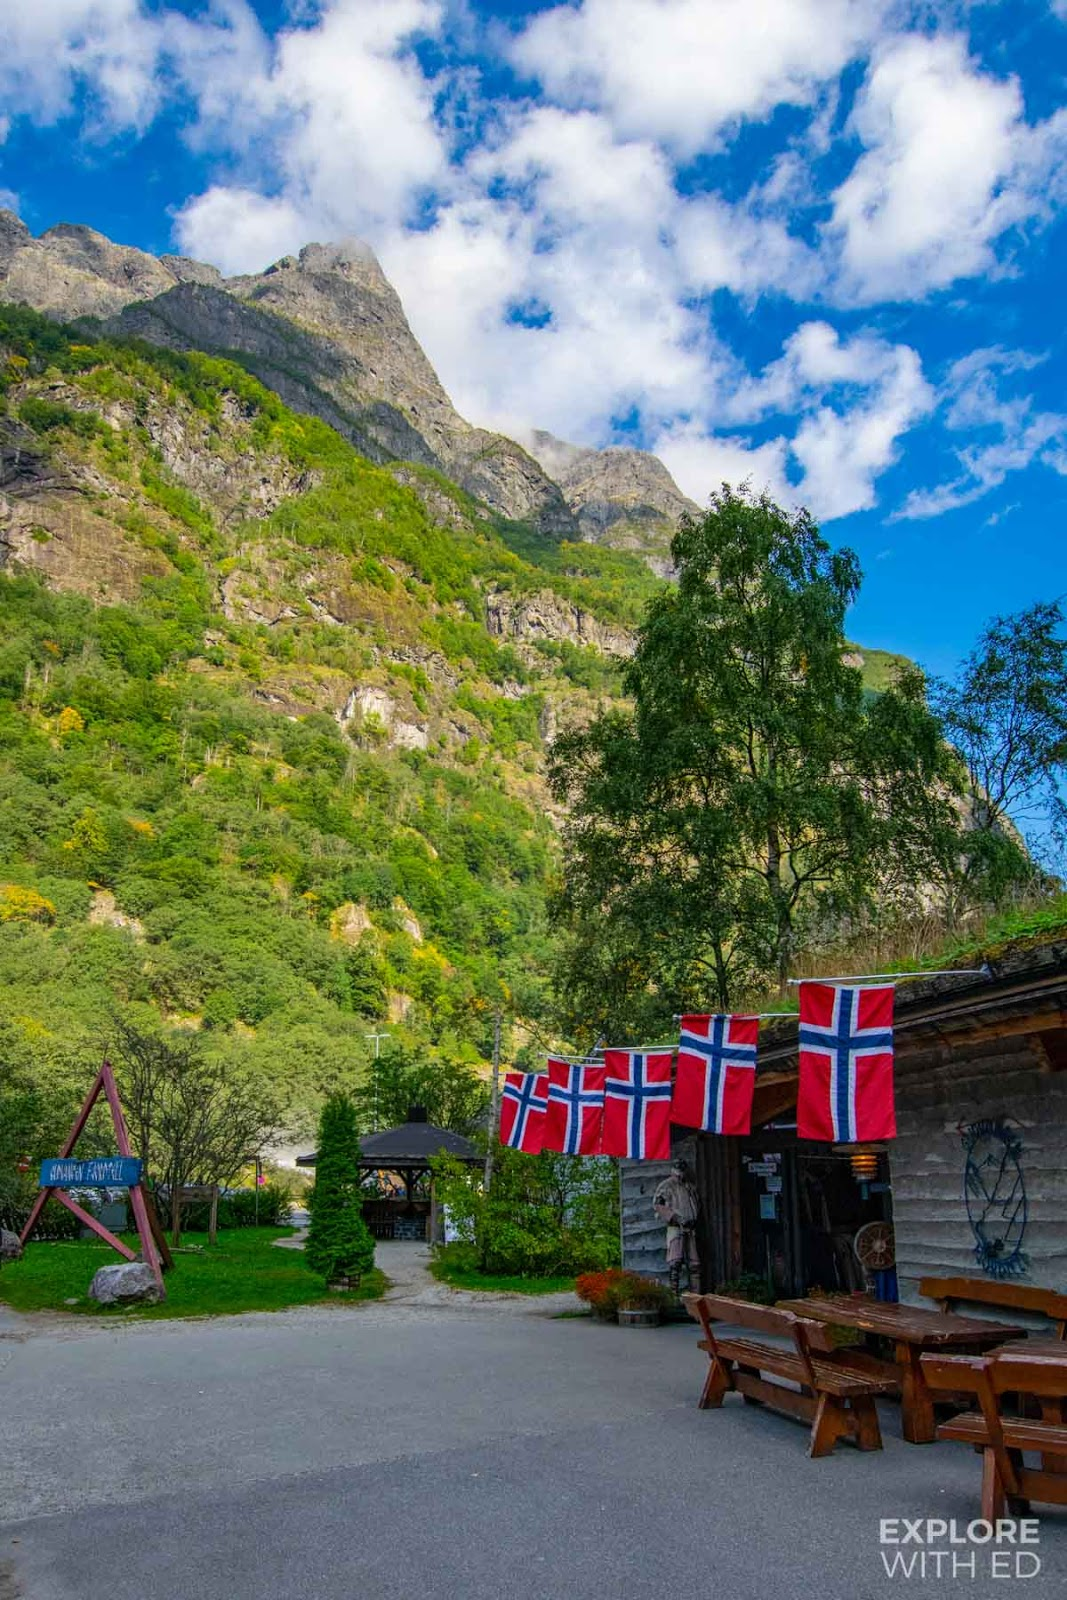 The Njardarheimr Viking Valley experience in Gudvangen